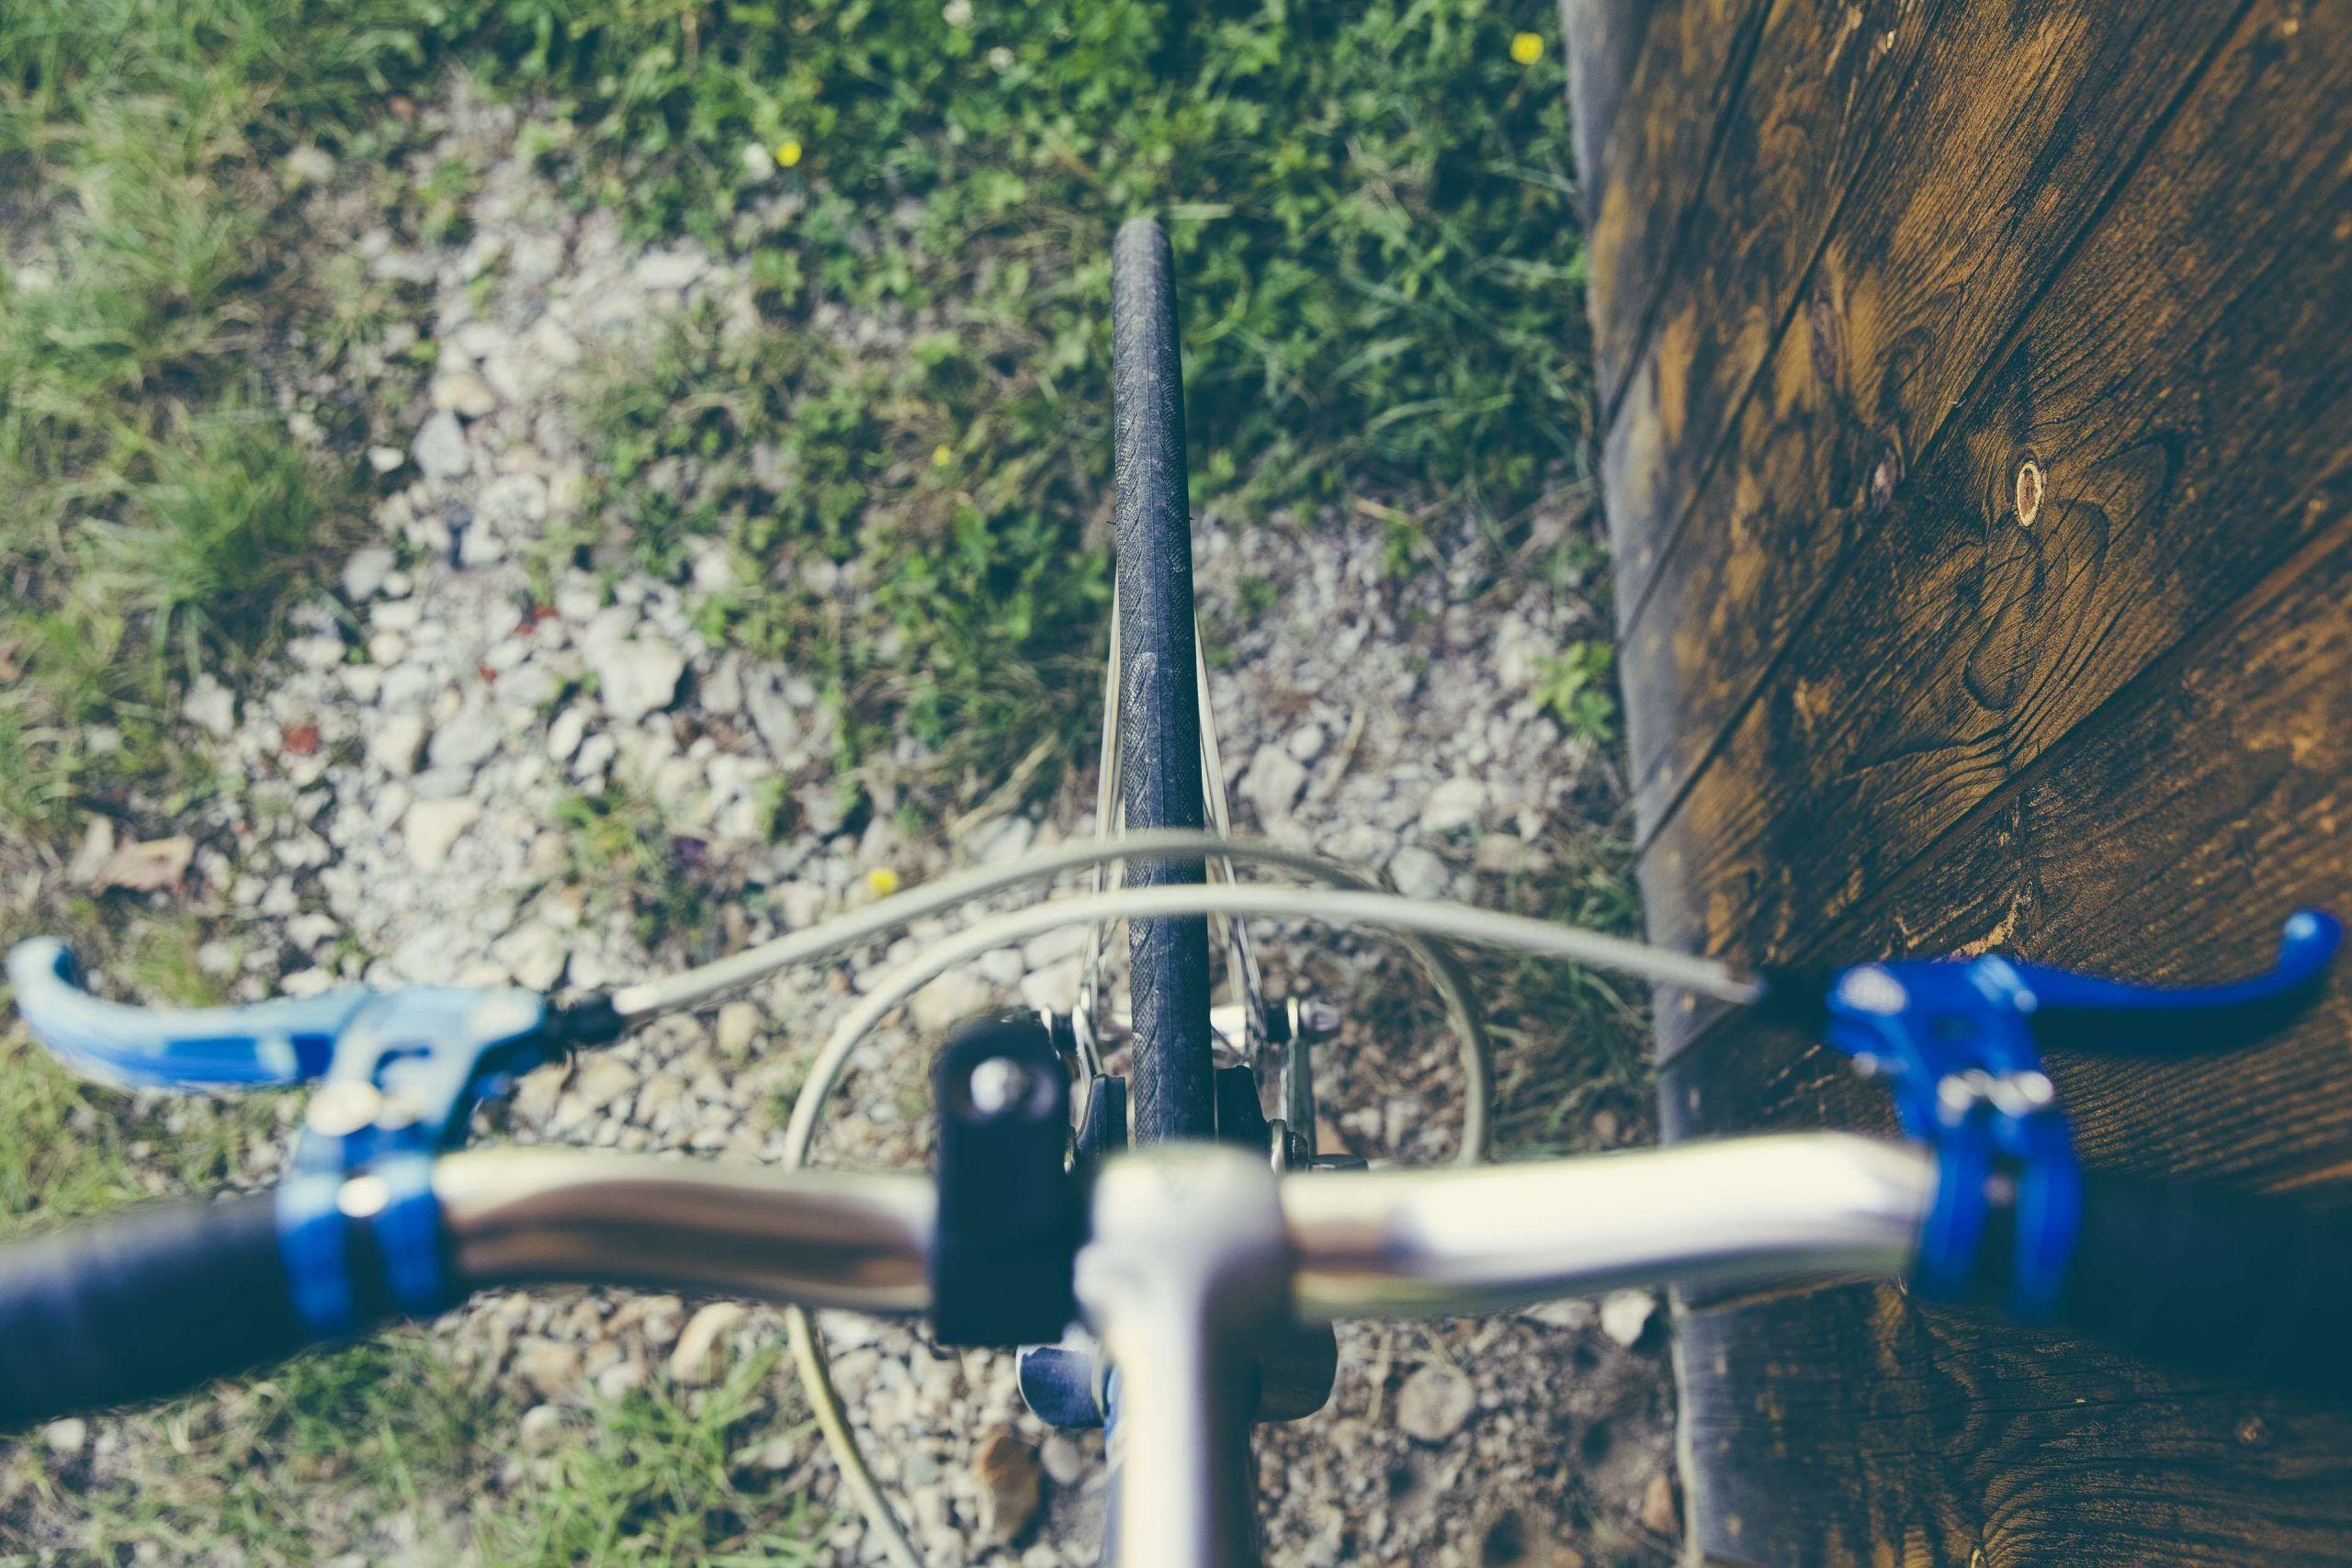 Bicycle Bike Brake Levers Cycle Grass Handle Bar Hardwood